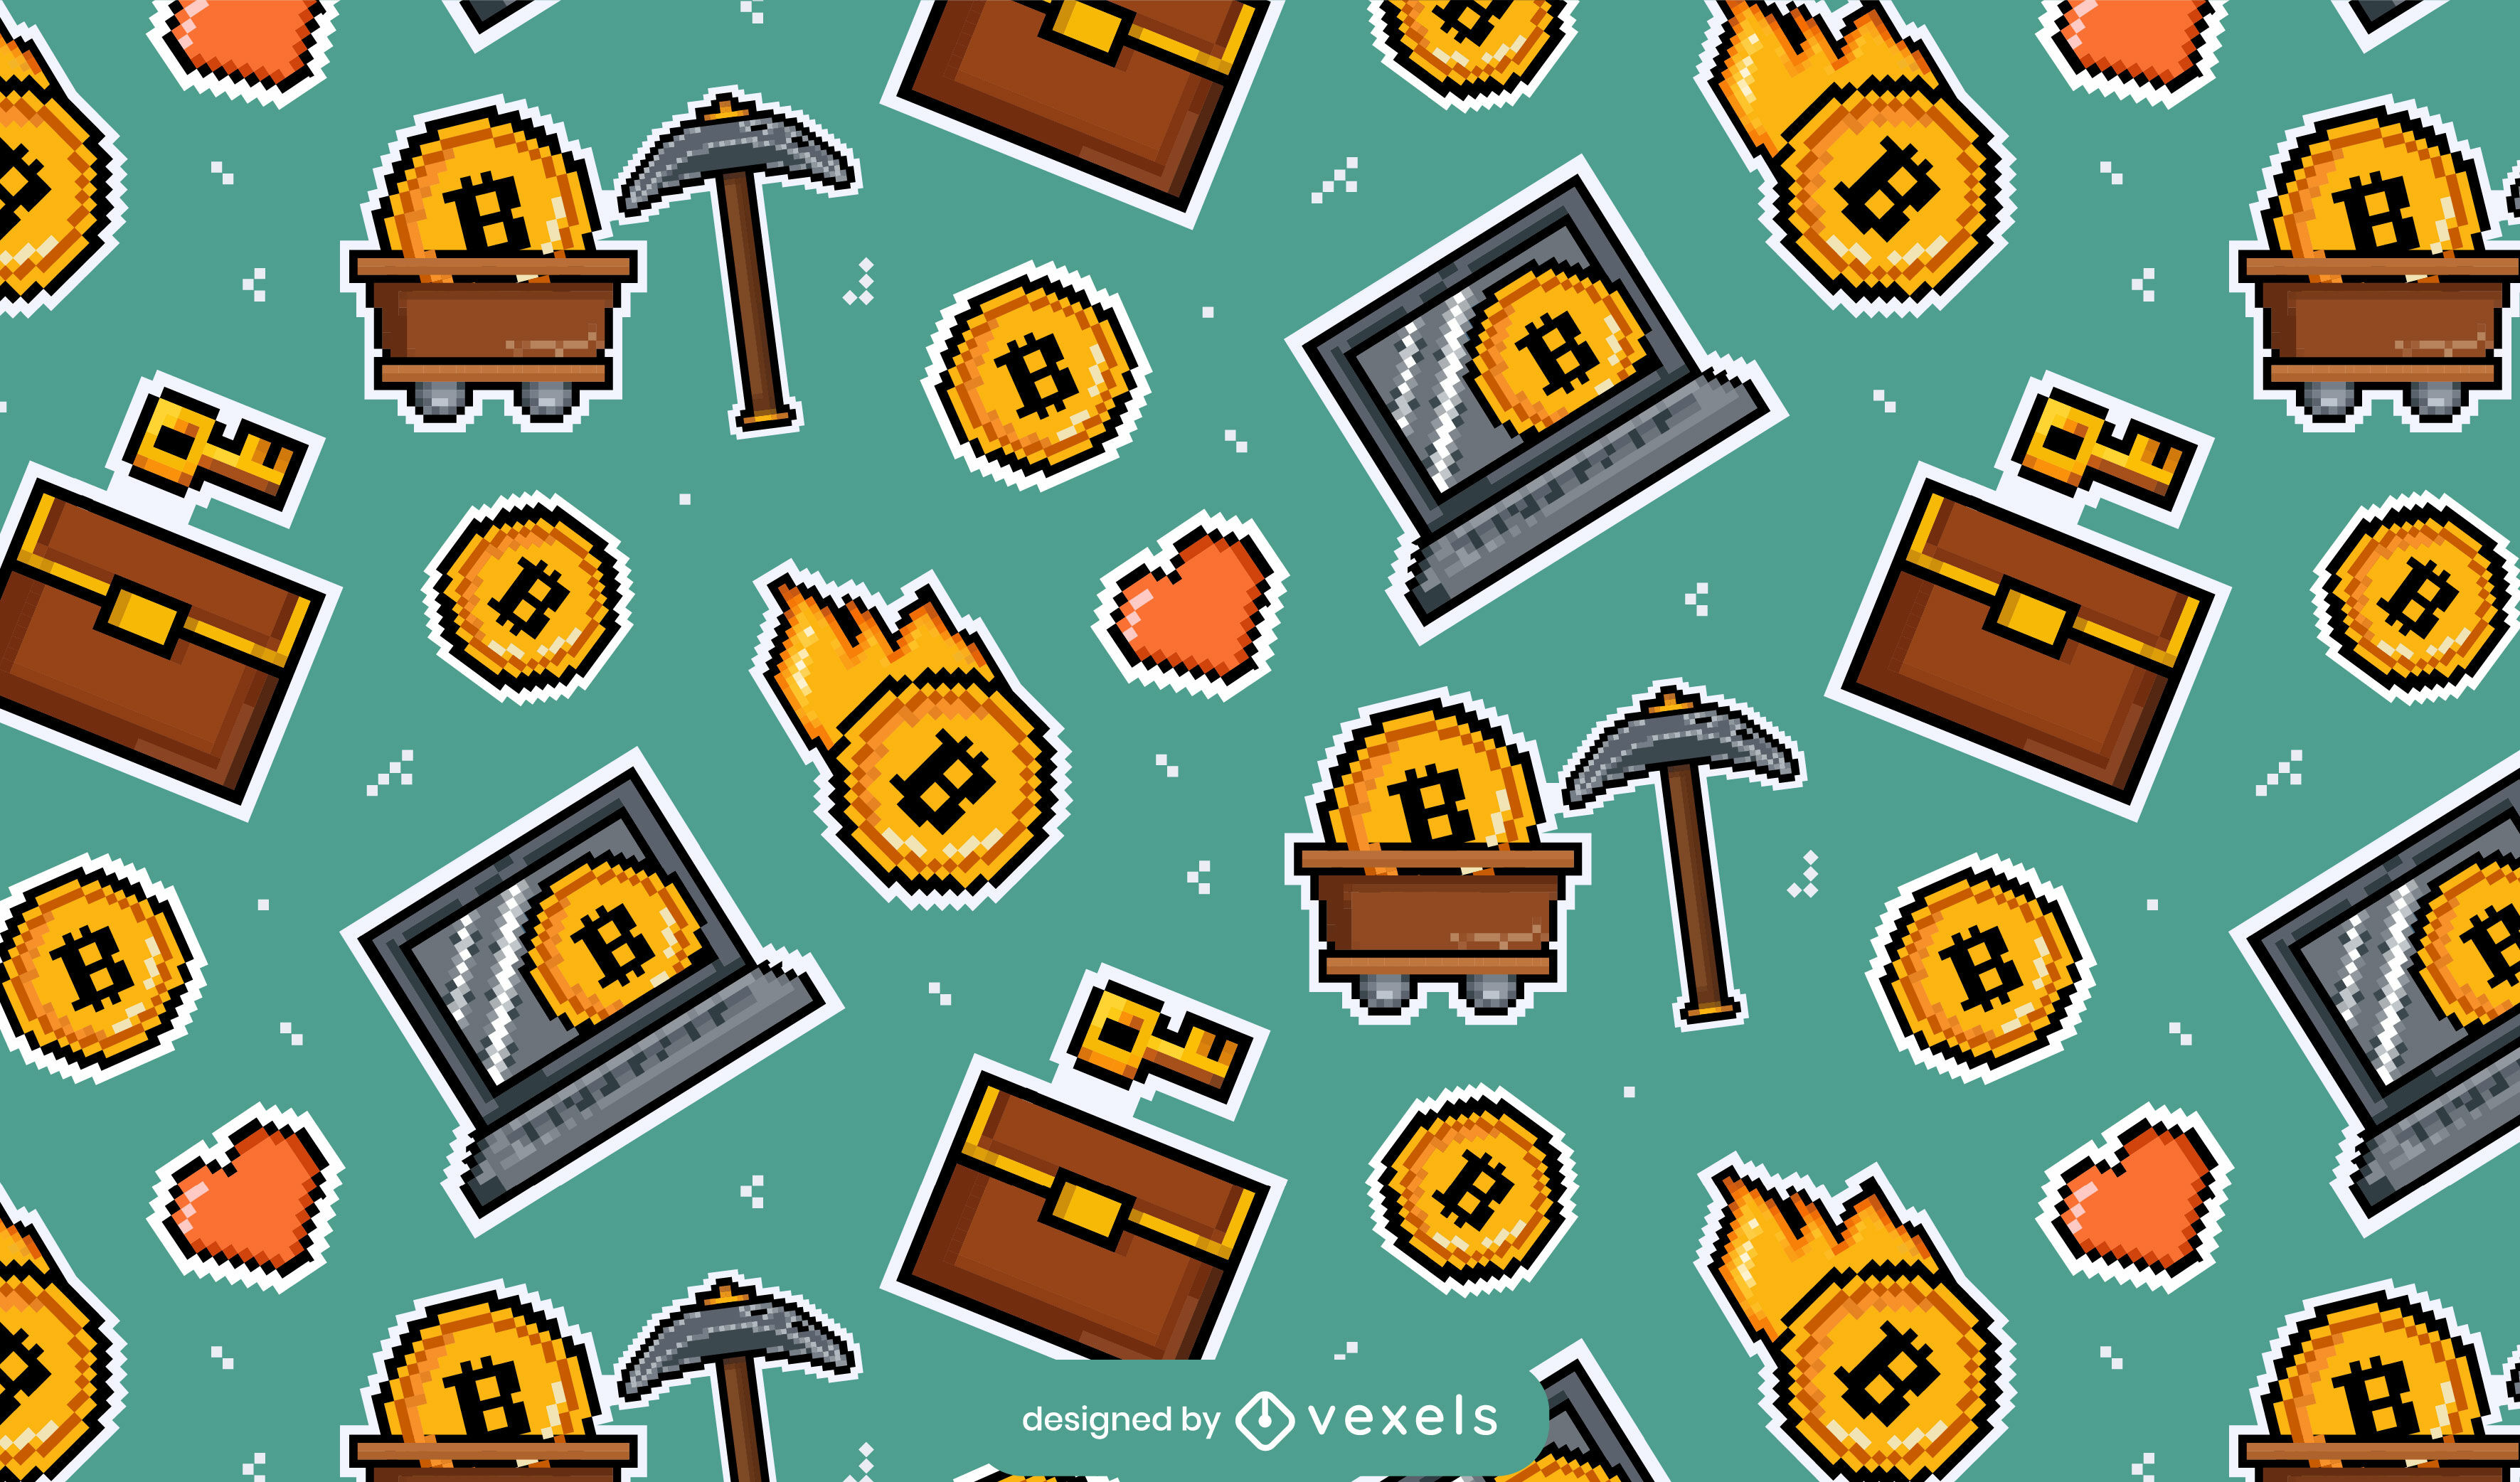 Patr?n de pixel art de elementos de Bitcoin